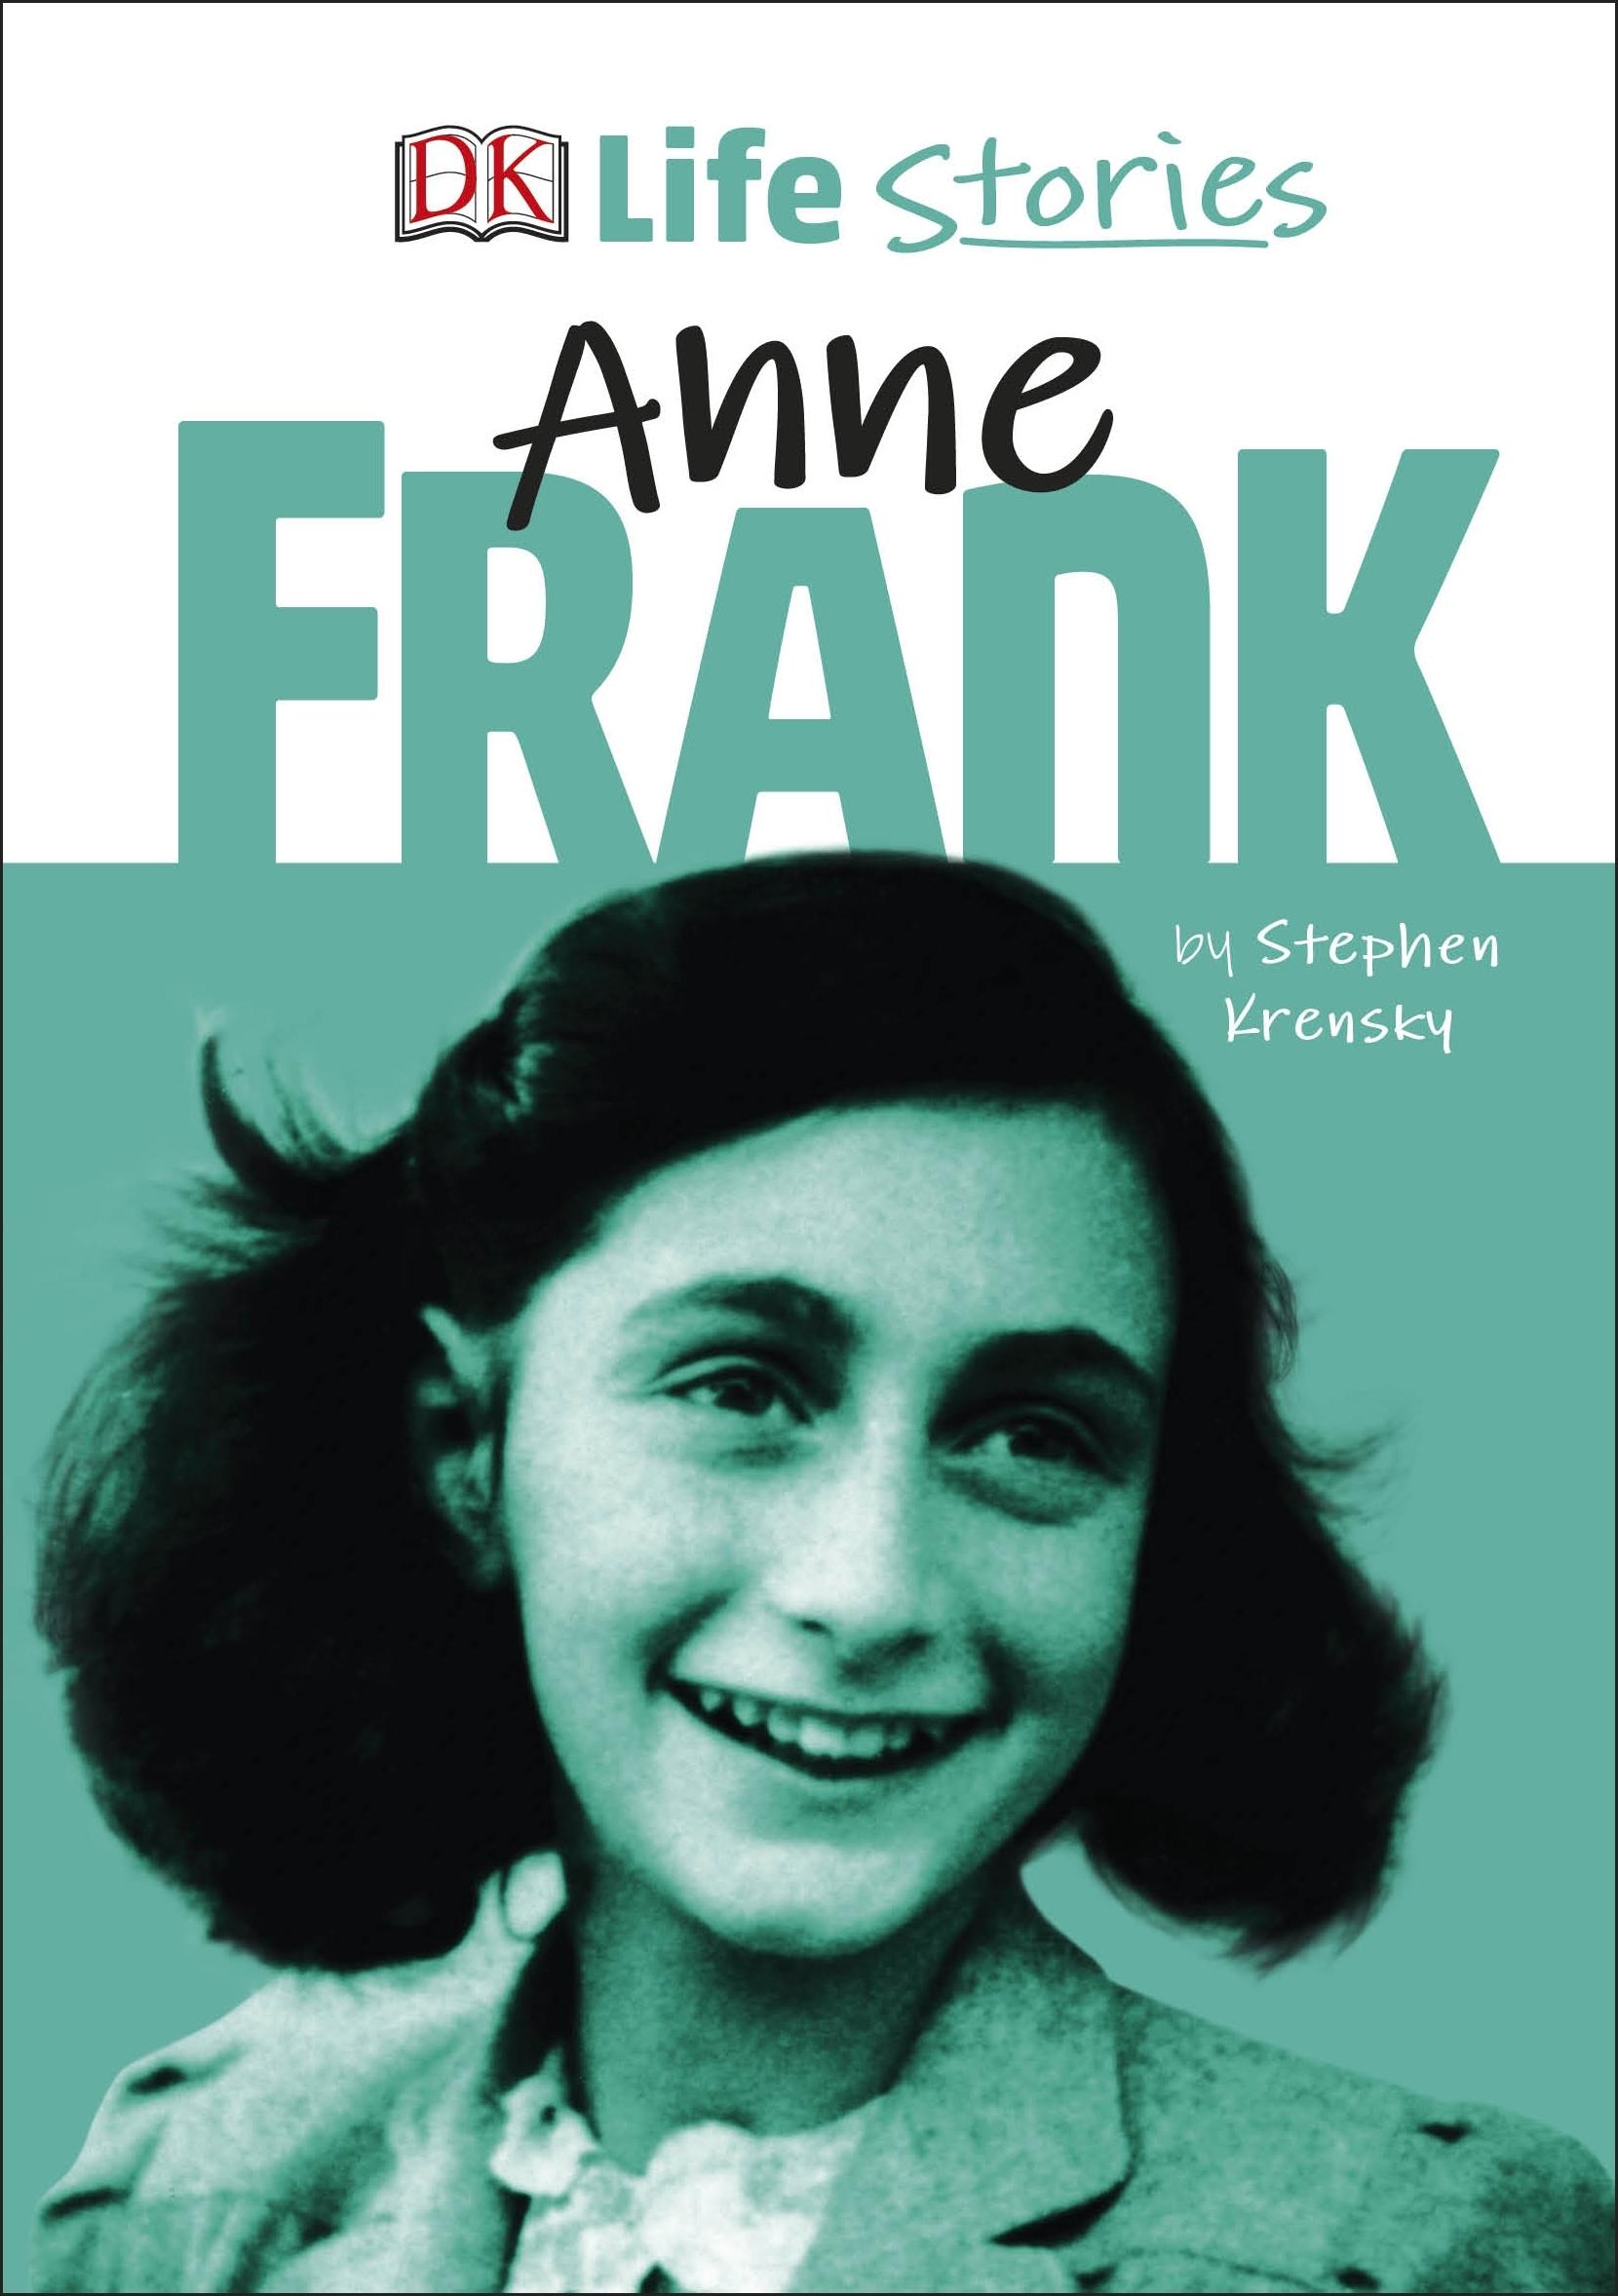 DK Life Stories Anne Frank